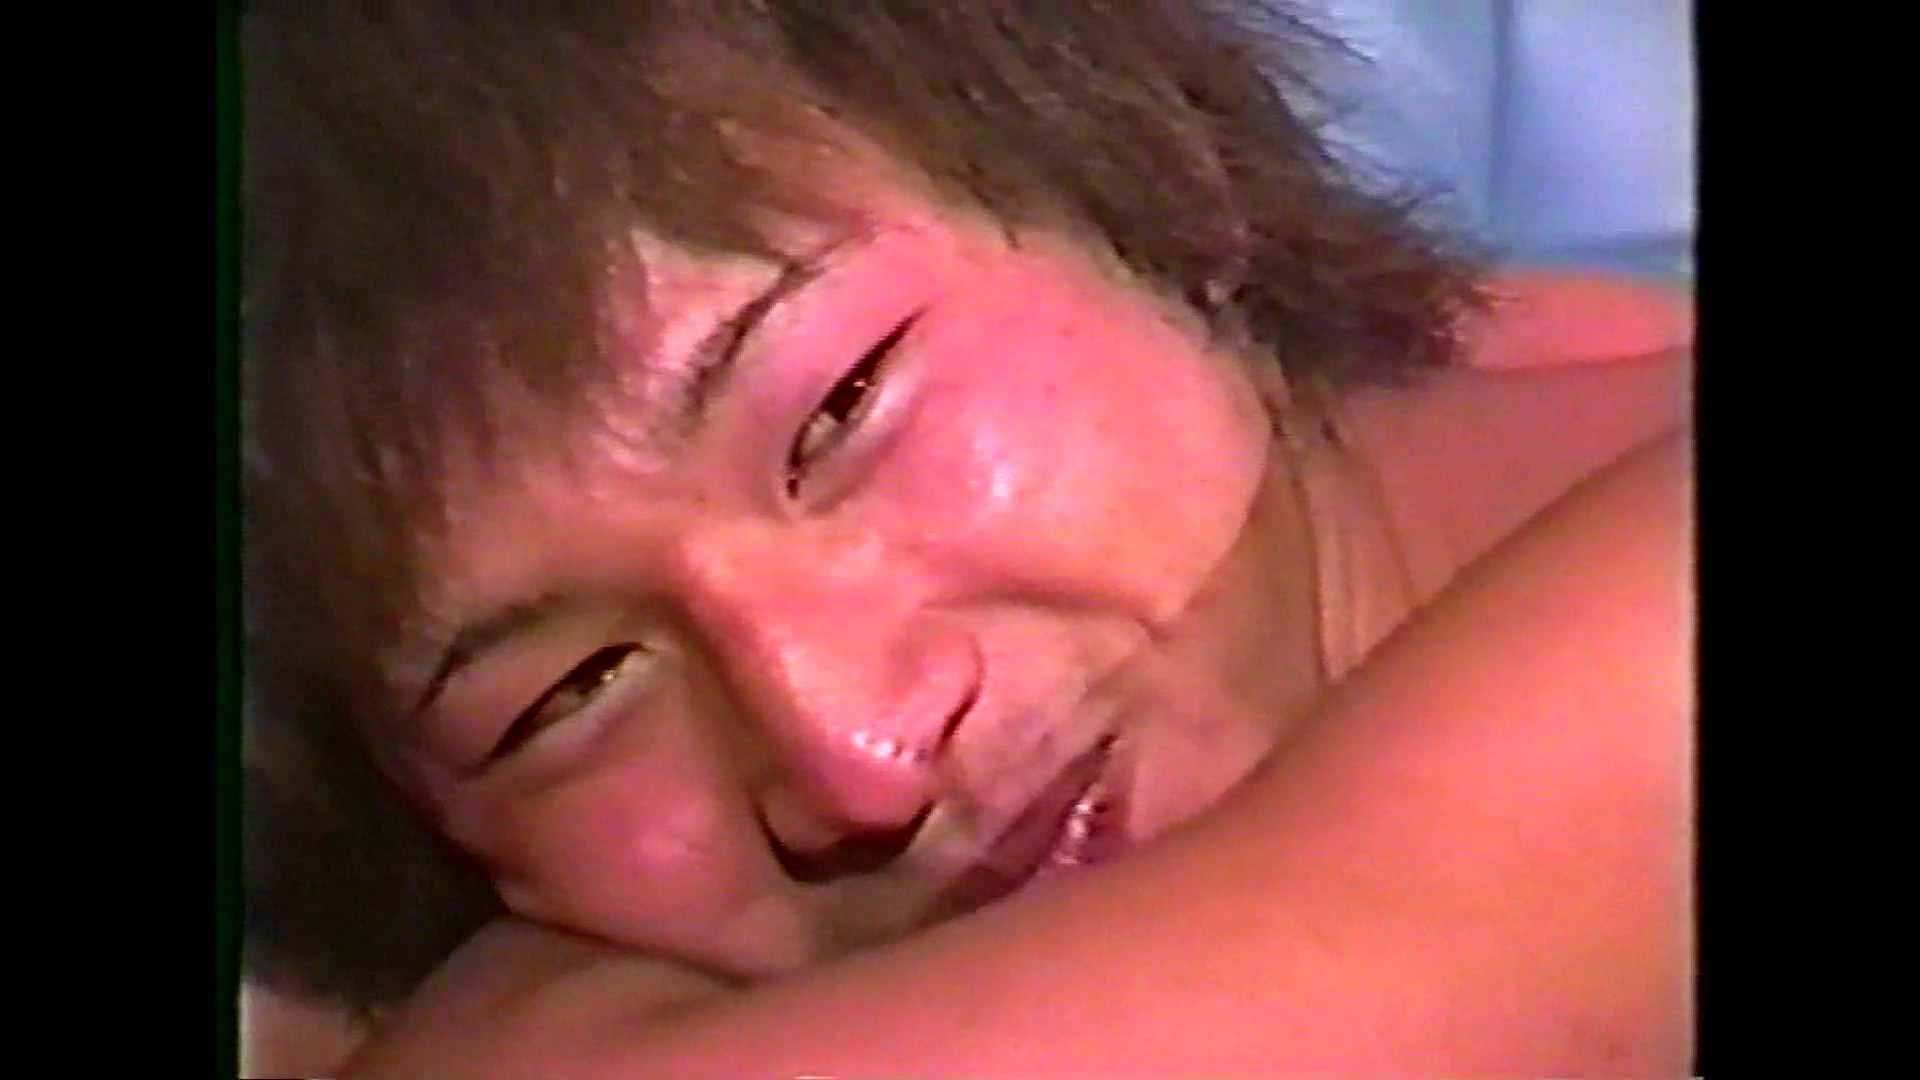 GAYBOY宏のオカズ倉庫Vol.3-4 お風呂 ゲイ丸見え画像 91pic 7